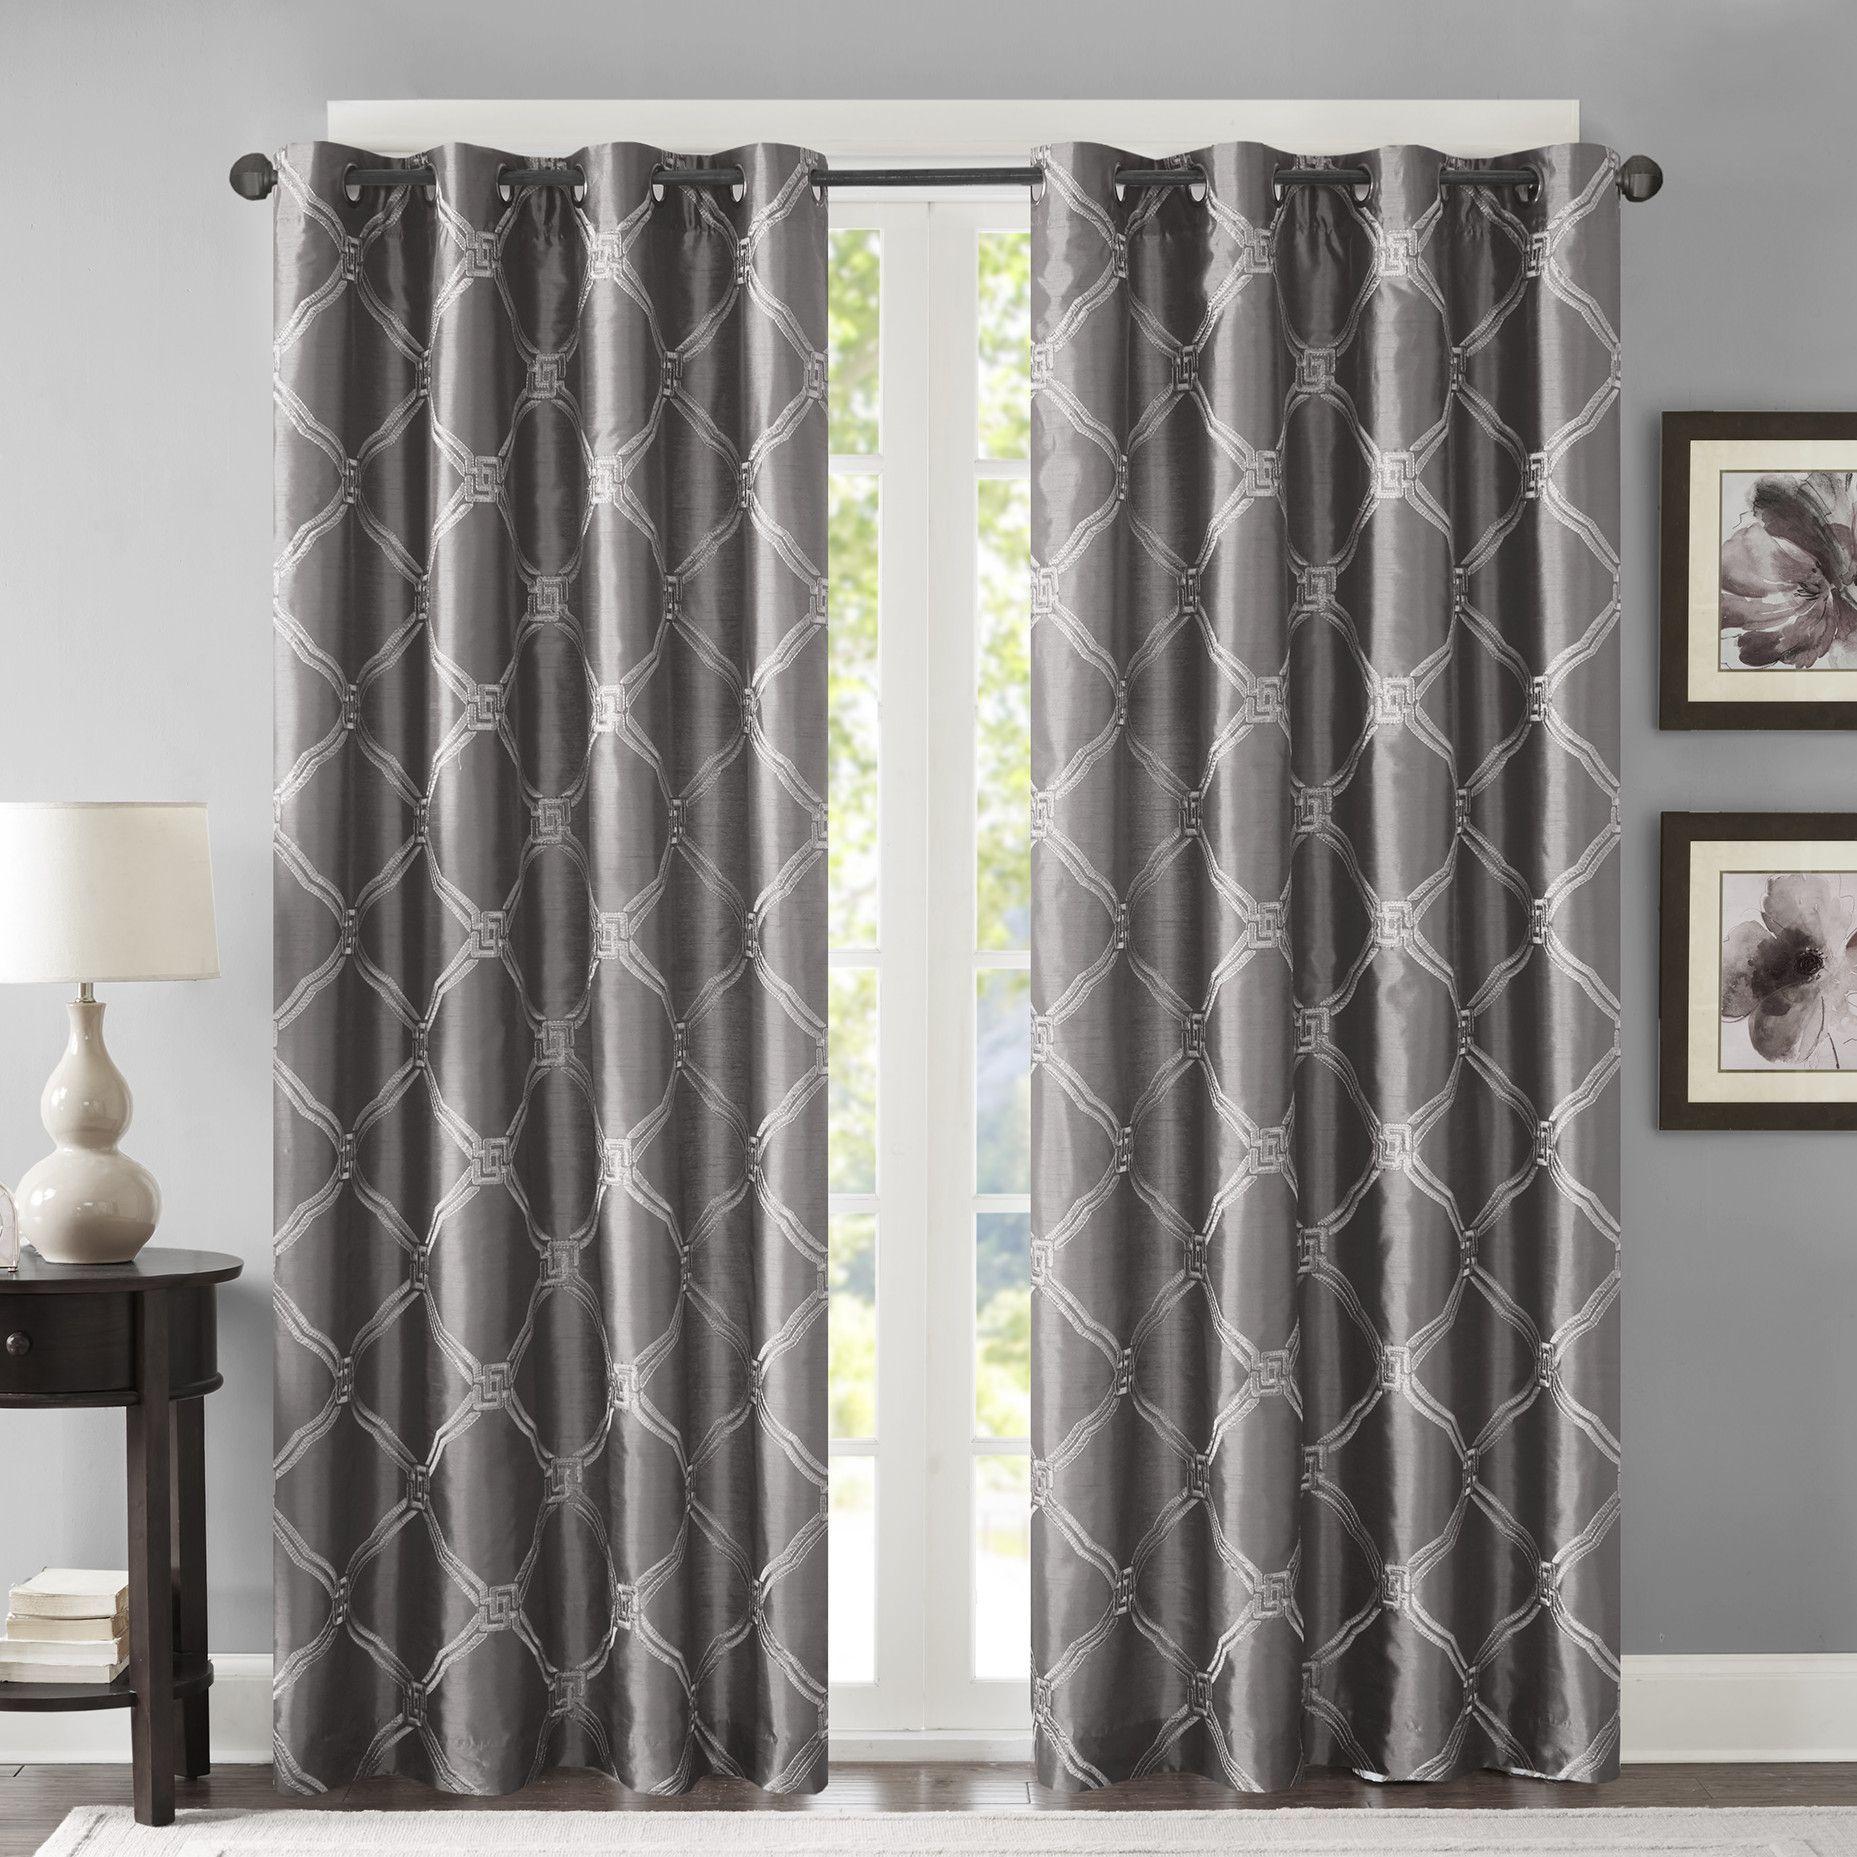 Teramo geometric room darkening grommet single curtain panel products